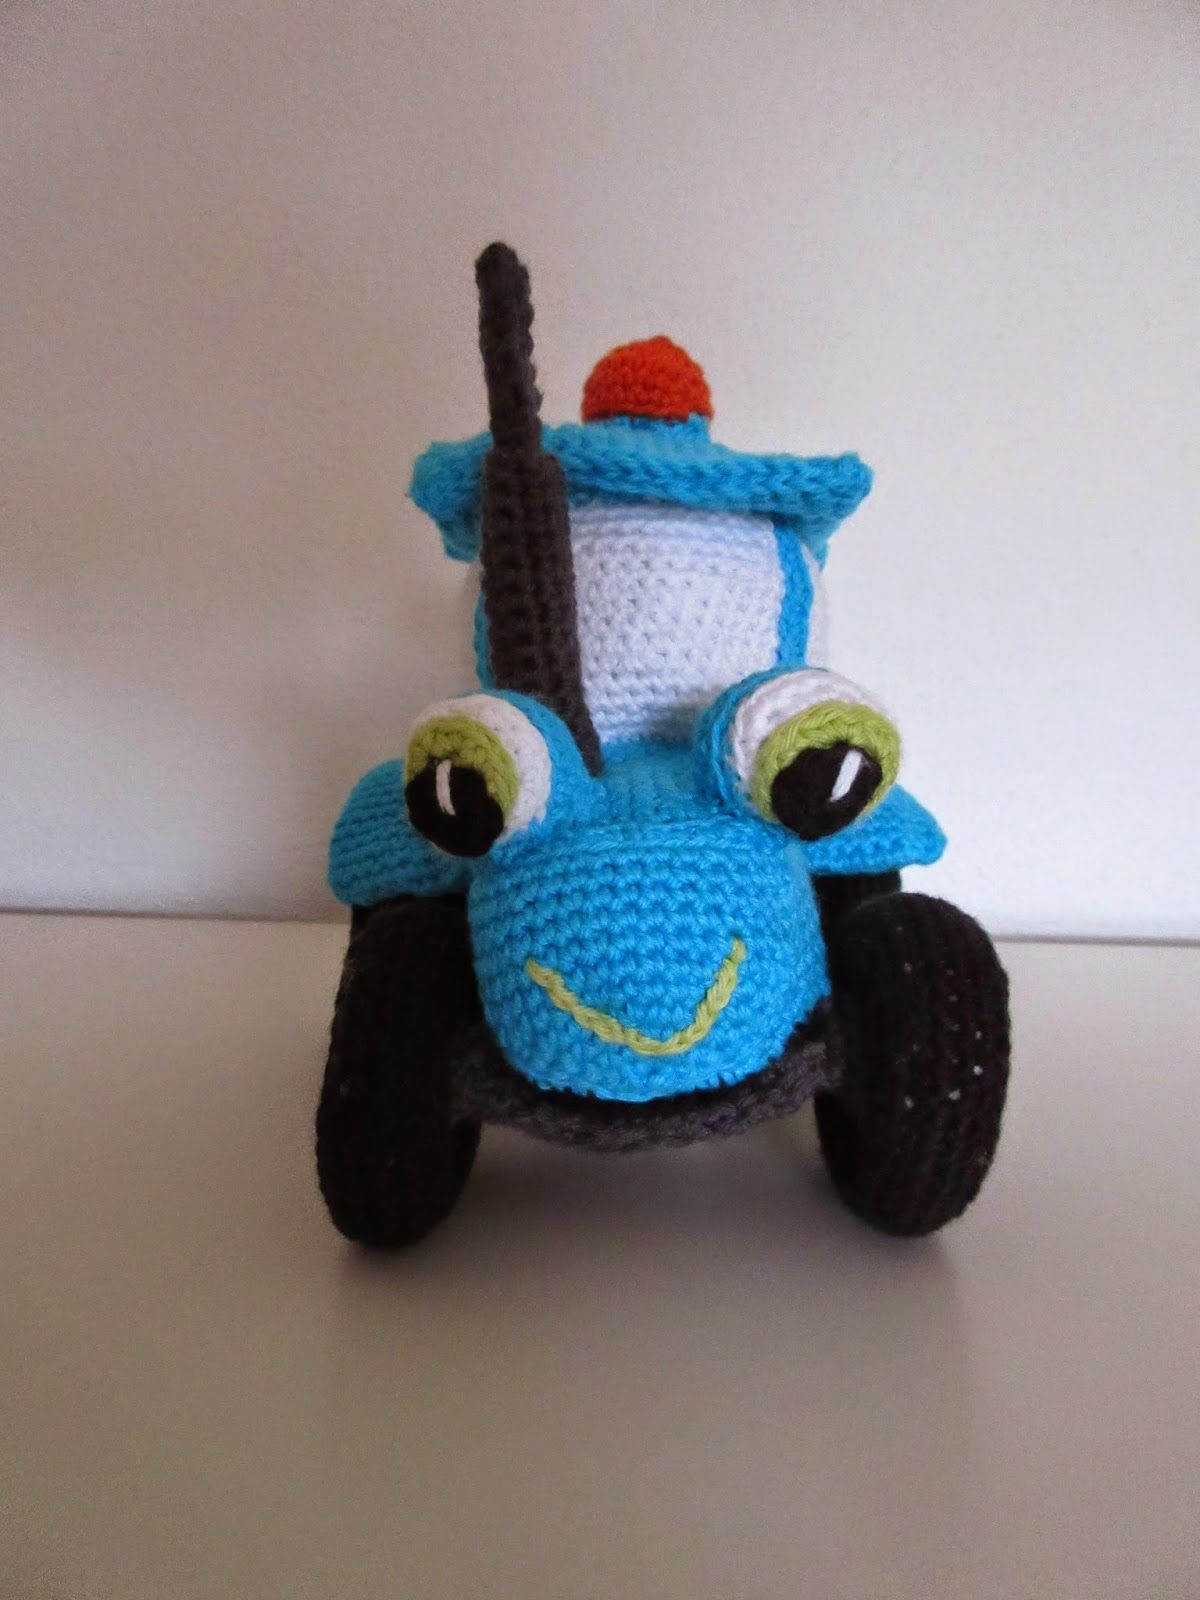 By Dalhoff: Hæklet traktor